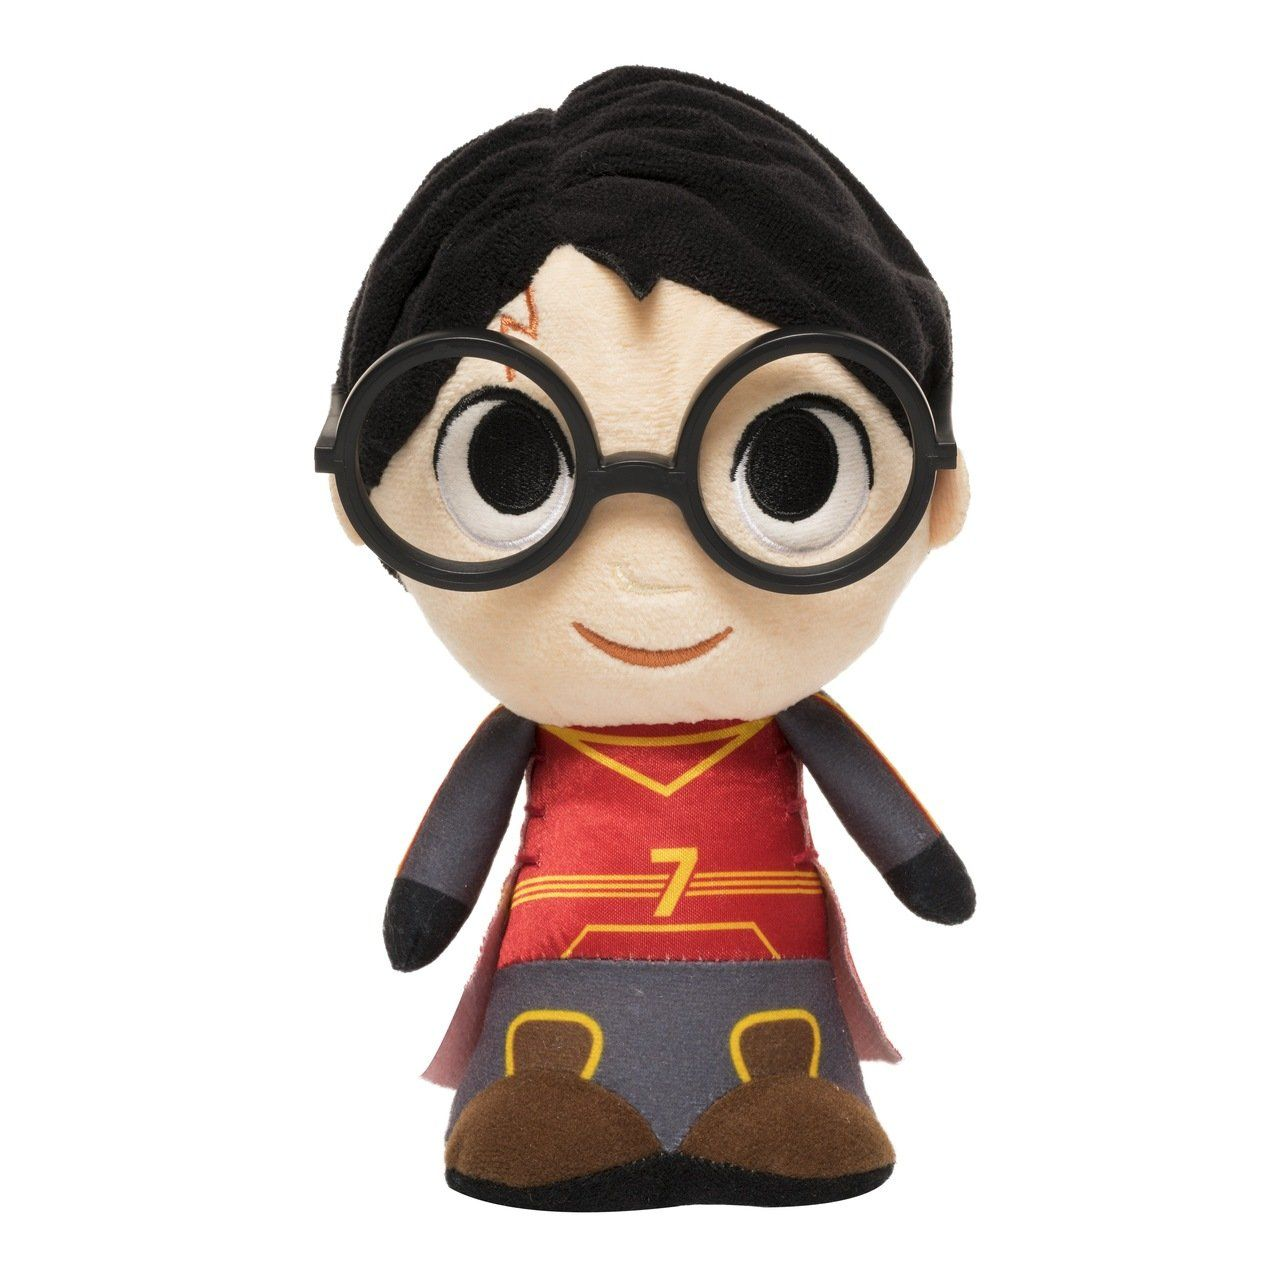 PRÉ VENDA: Pelúcia Harry Potter Uniforme de Quadribol - Harry Potter - Funko